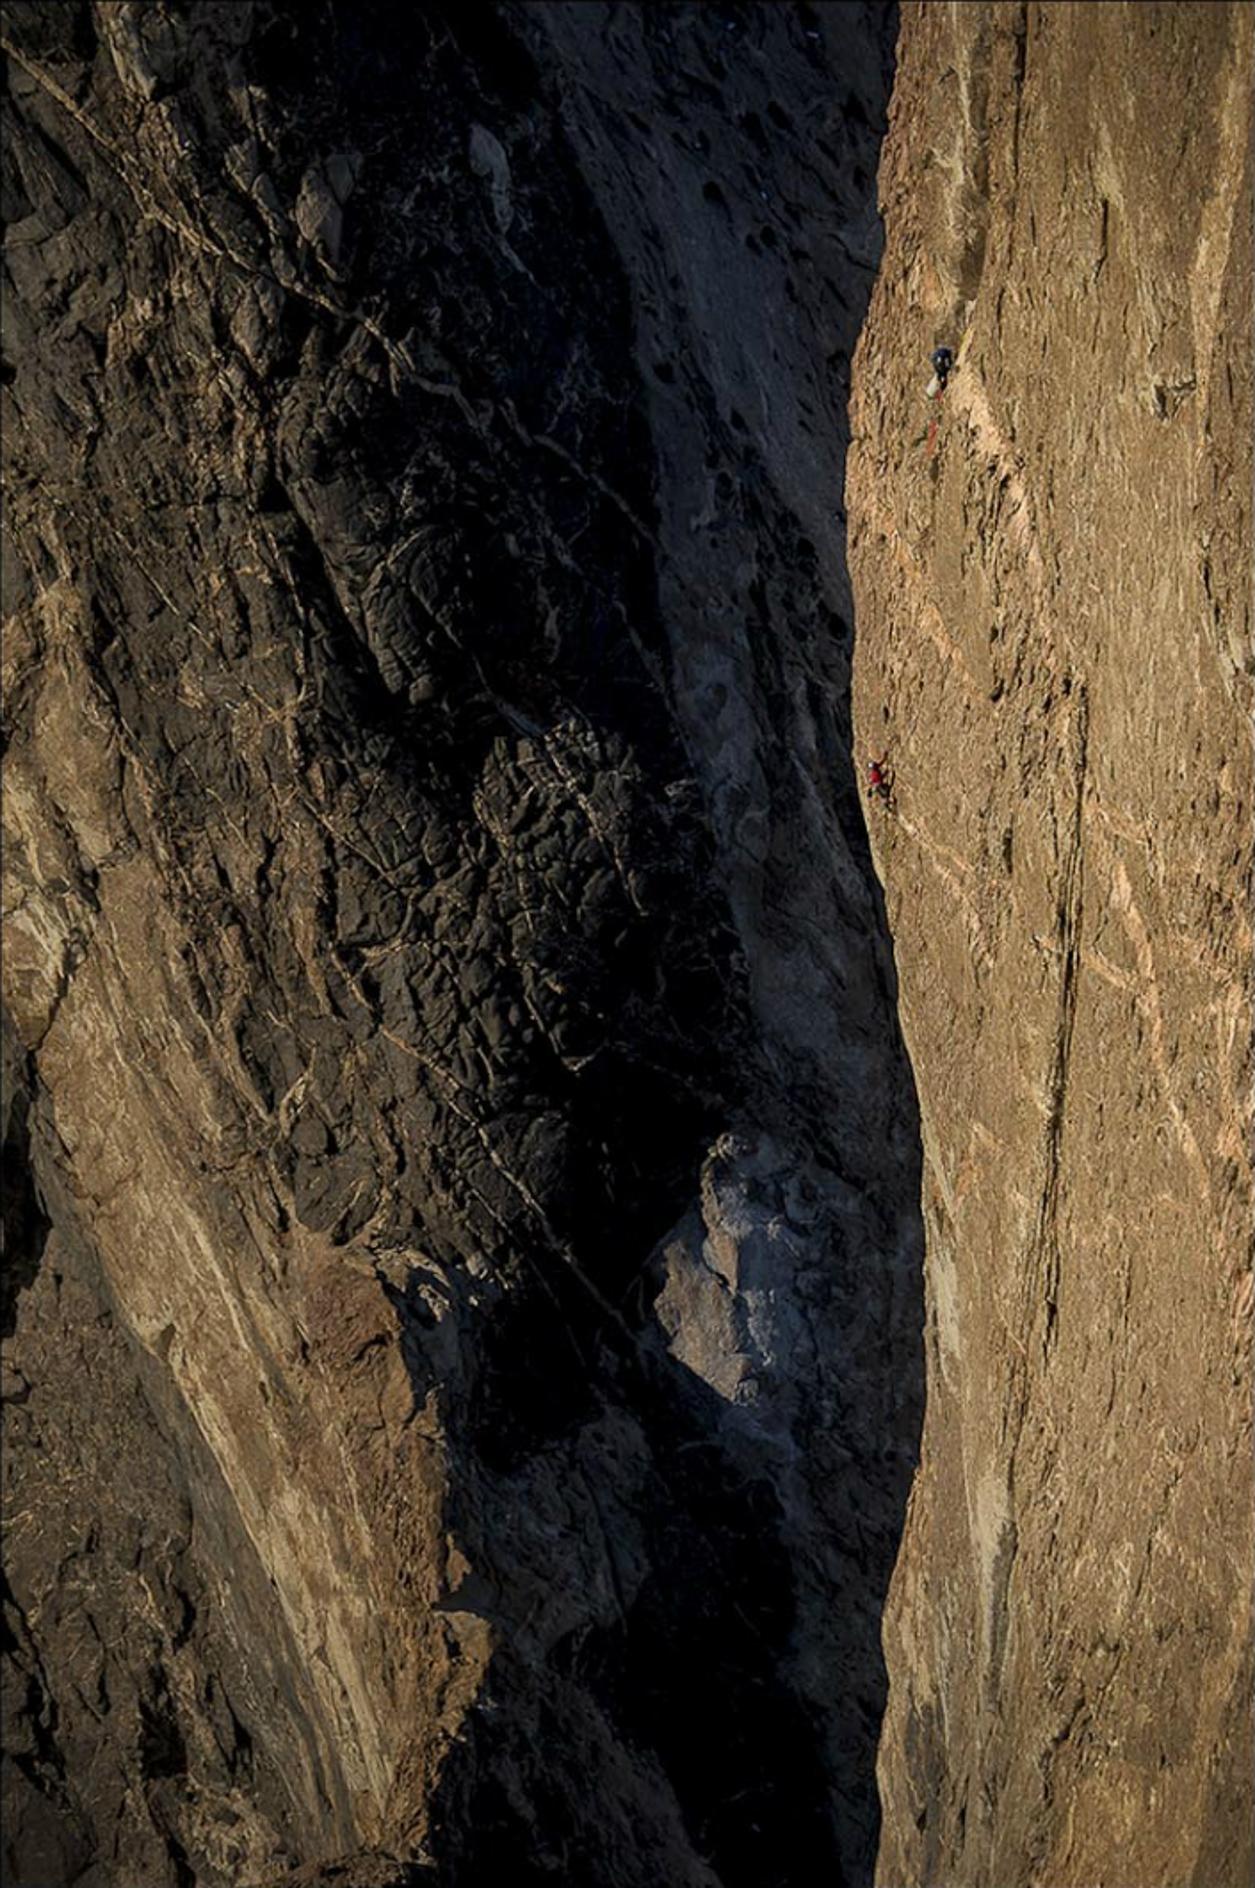 Cory-Richards-Photographer-Antarctica-13.jpg